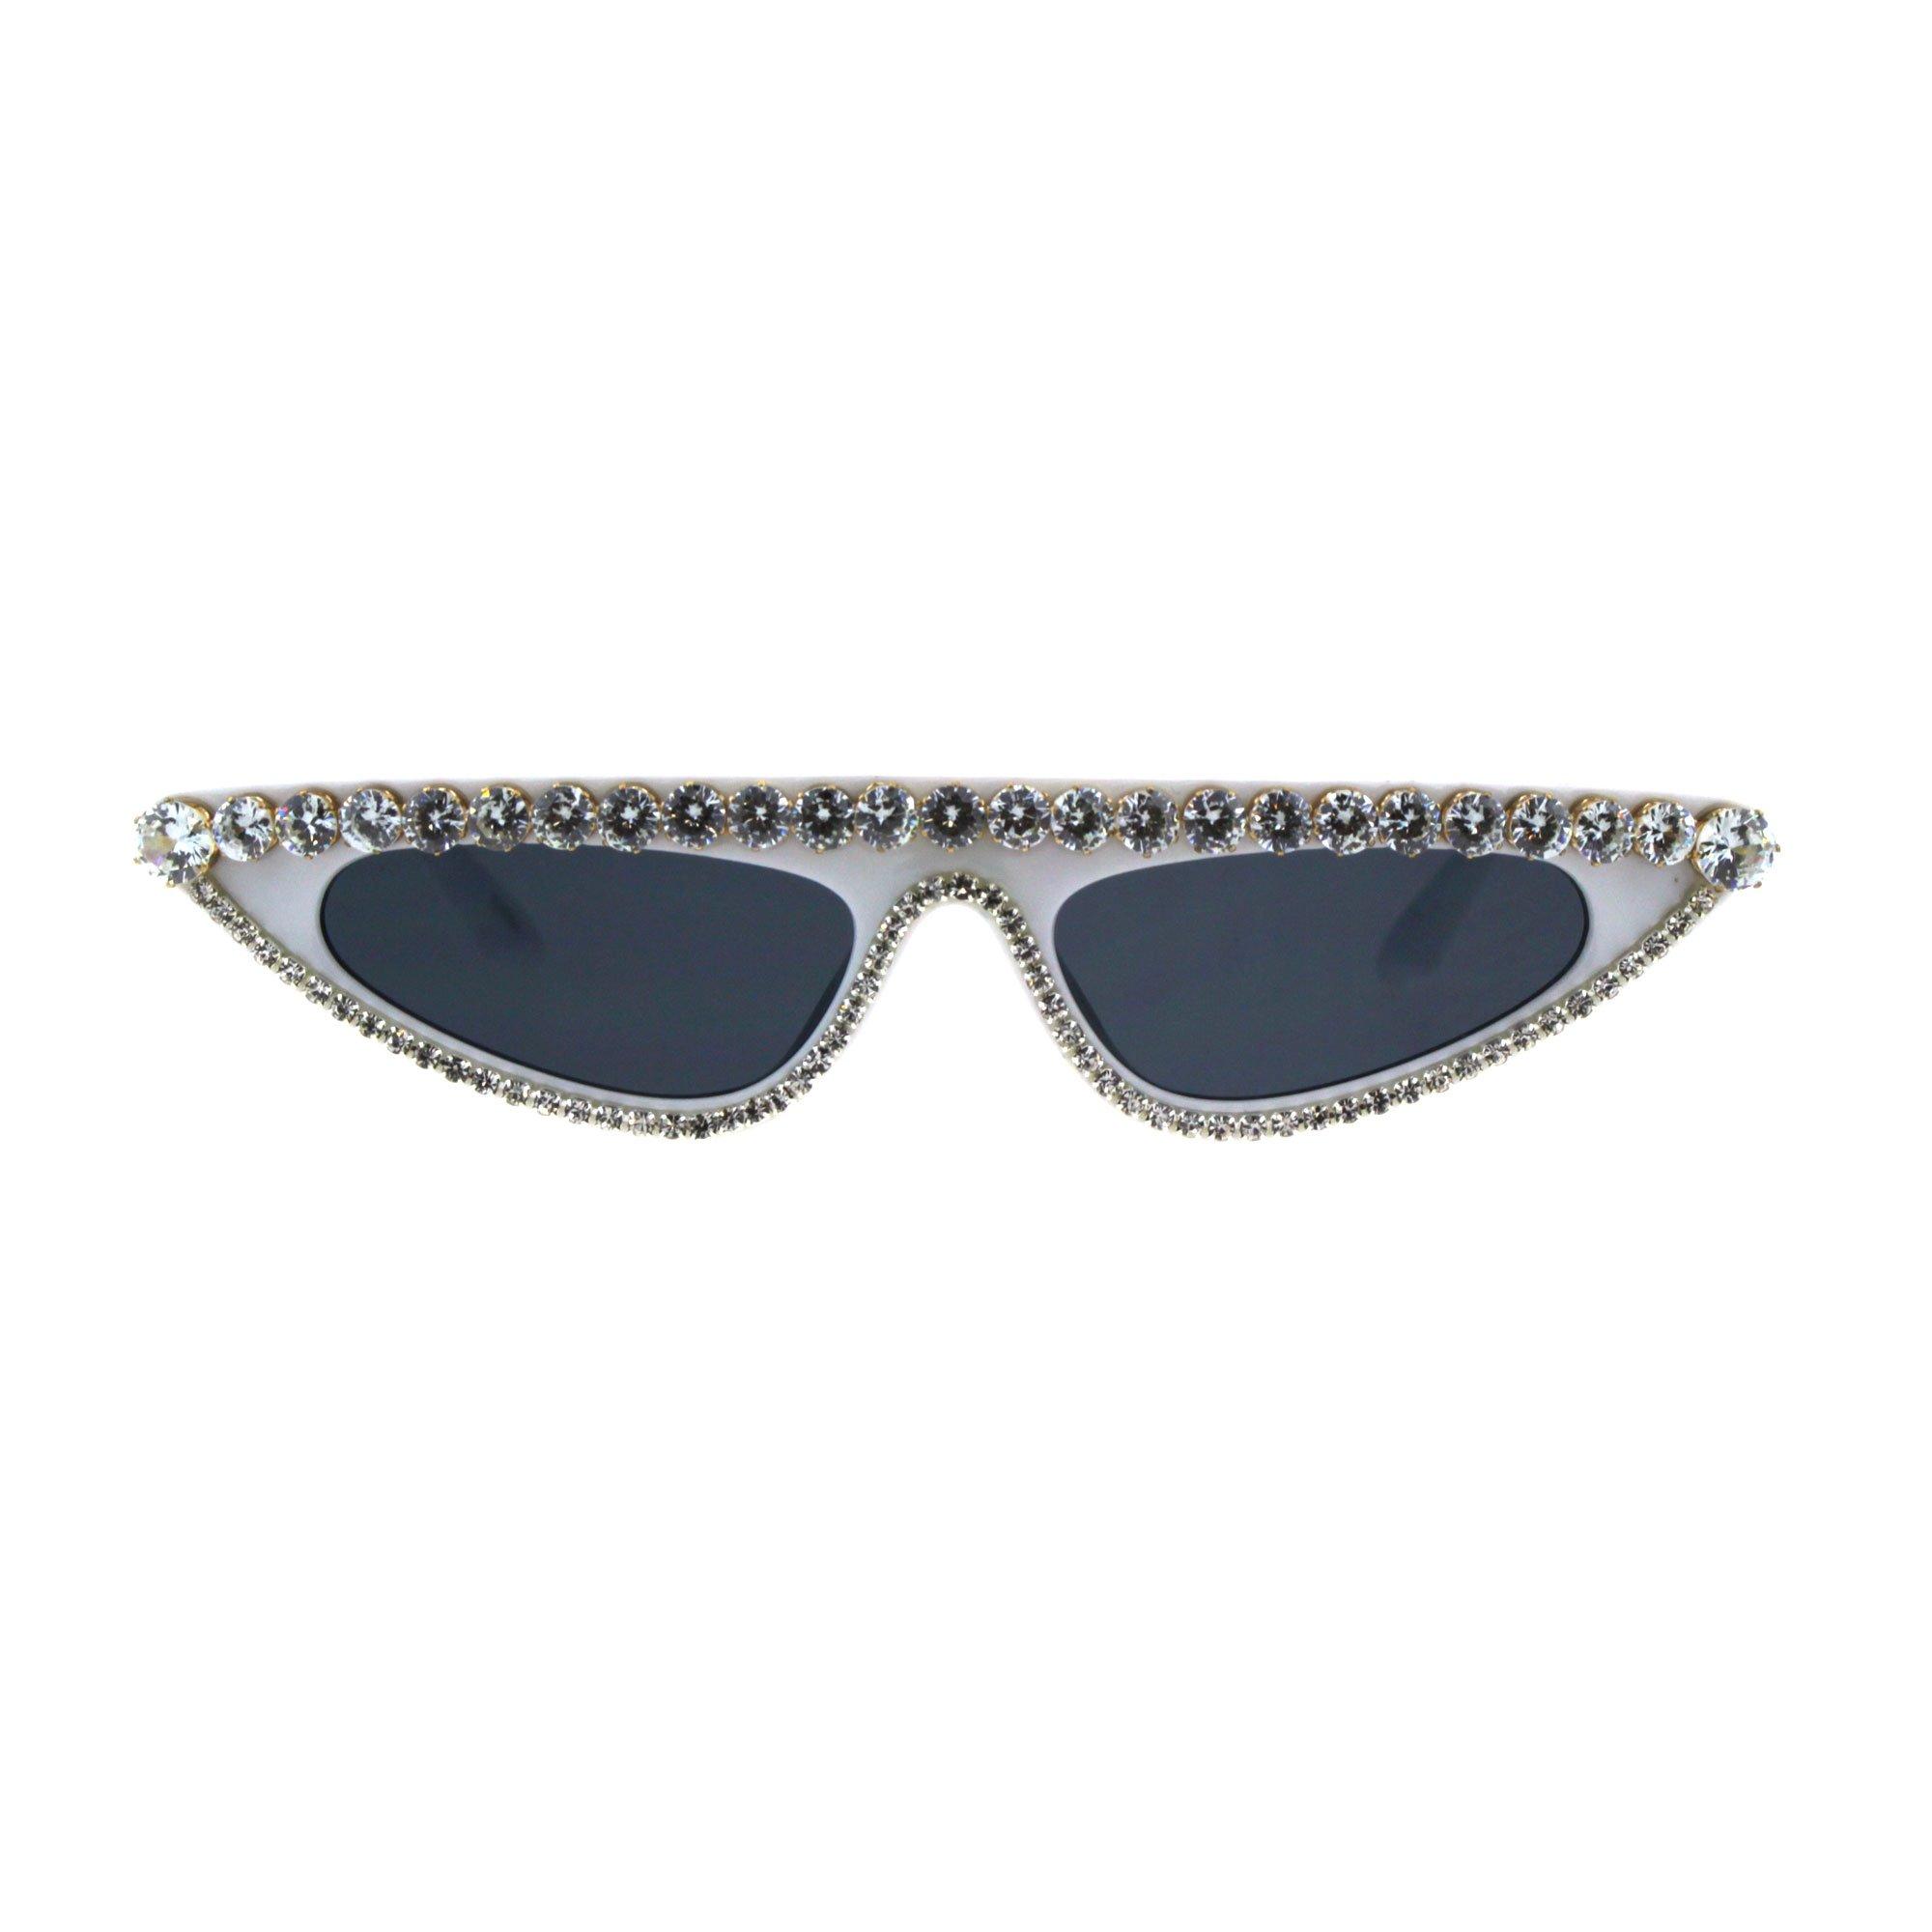 Womens Large Rhinestone Bling Flat Top Narrow Cat Eye Goth Sunglasses White